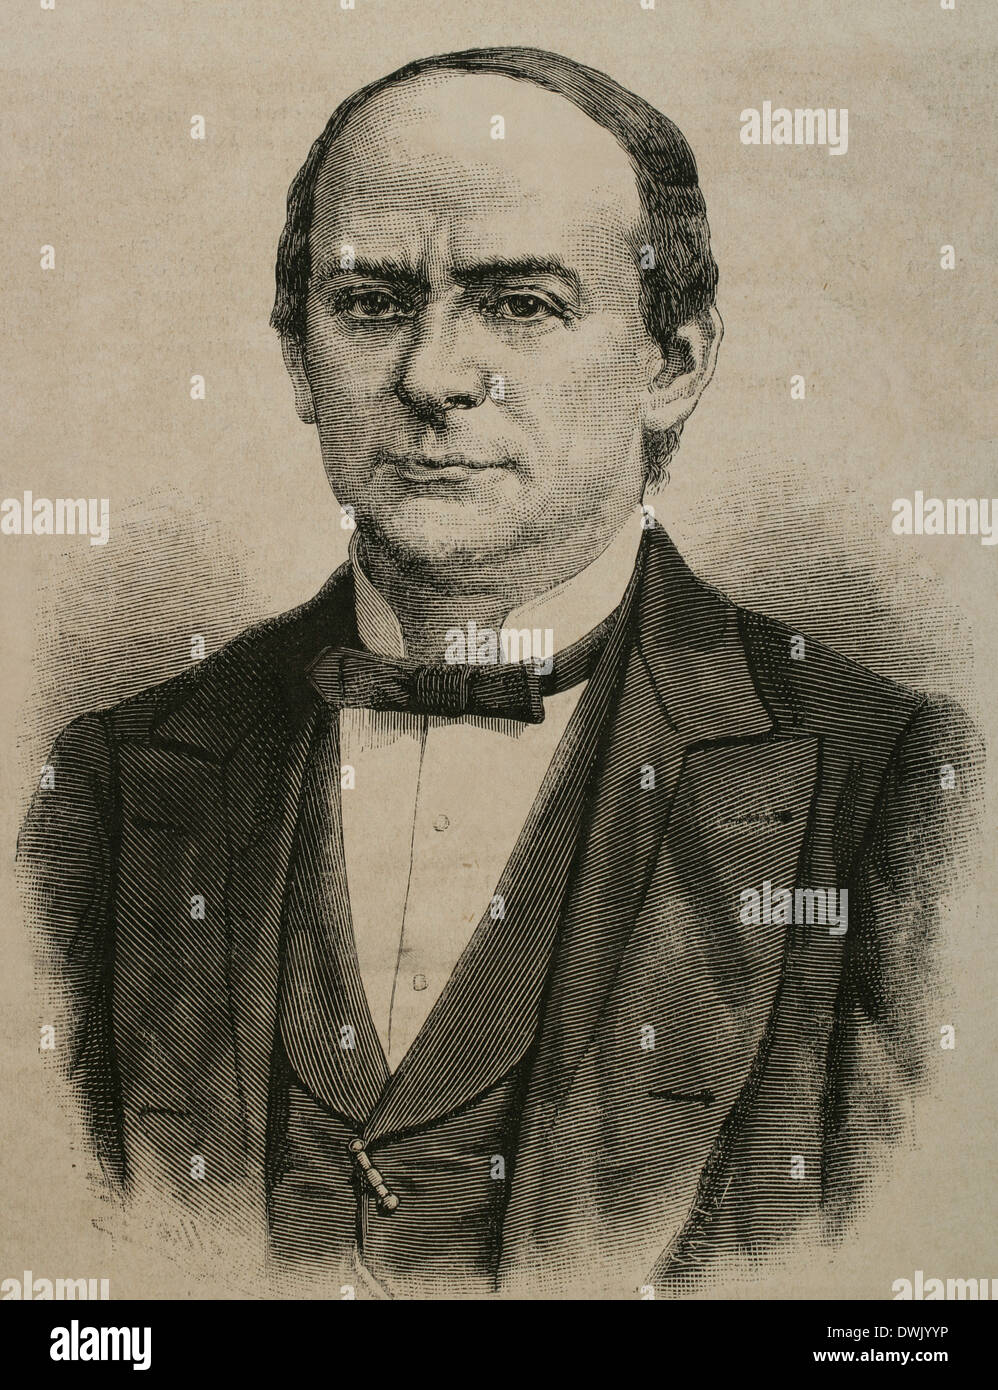 Sebastian Lerdo de Tejada (1823-1889). Jurist and Liberal president of Mexico. Engraving. - Stock Image